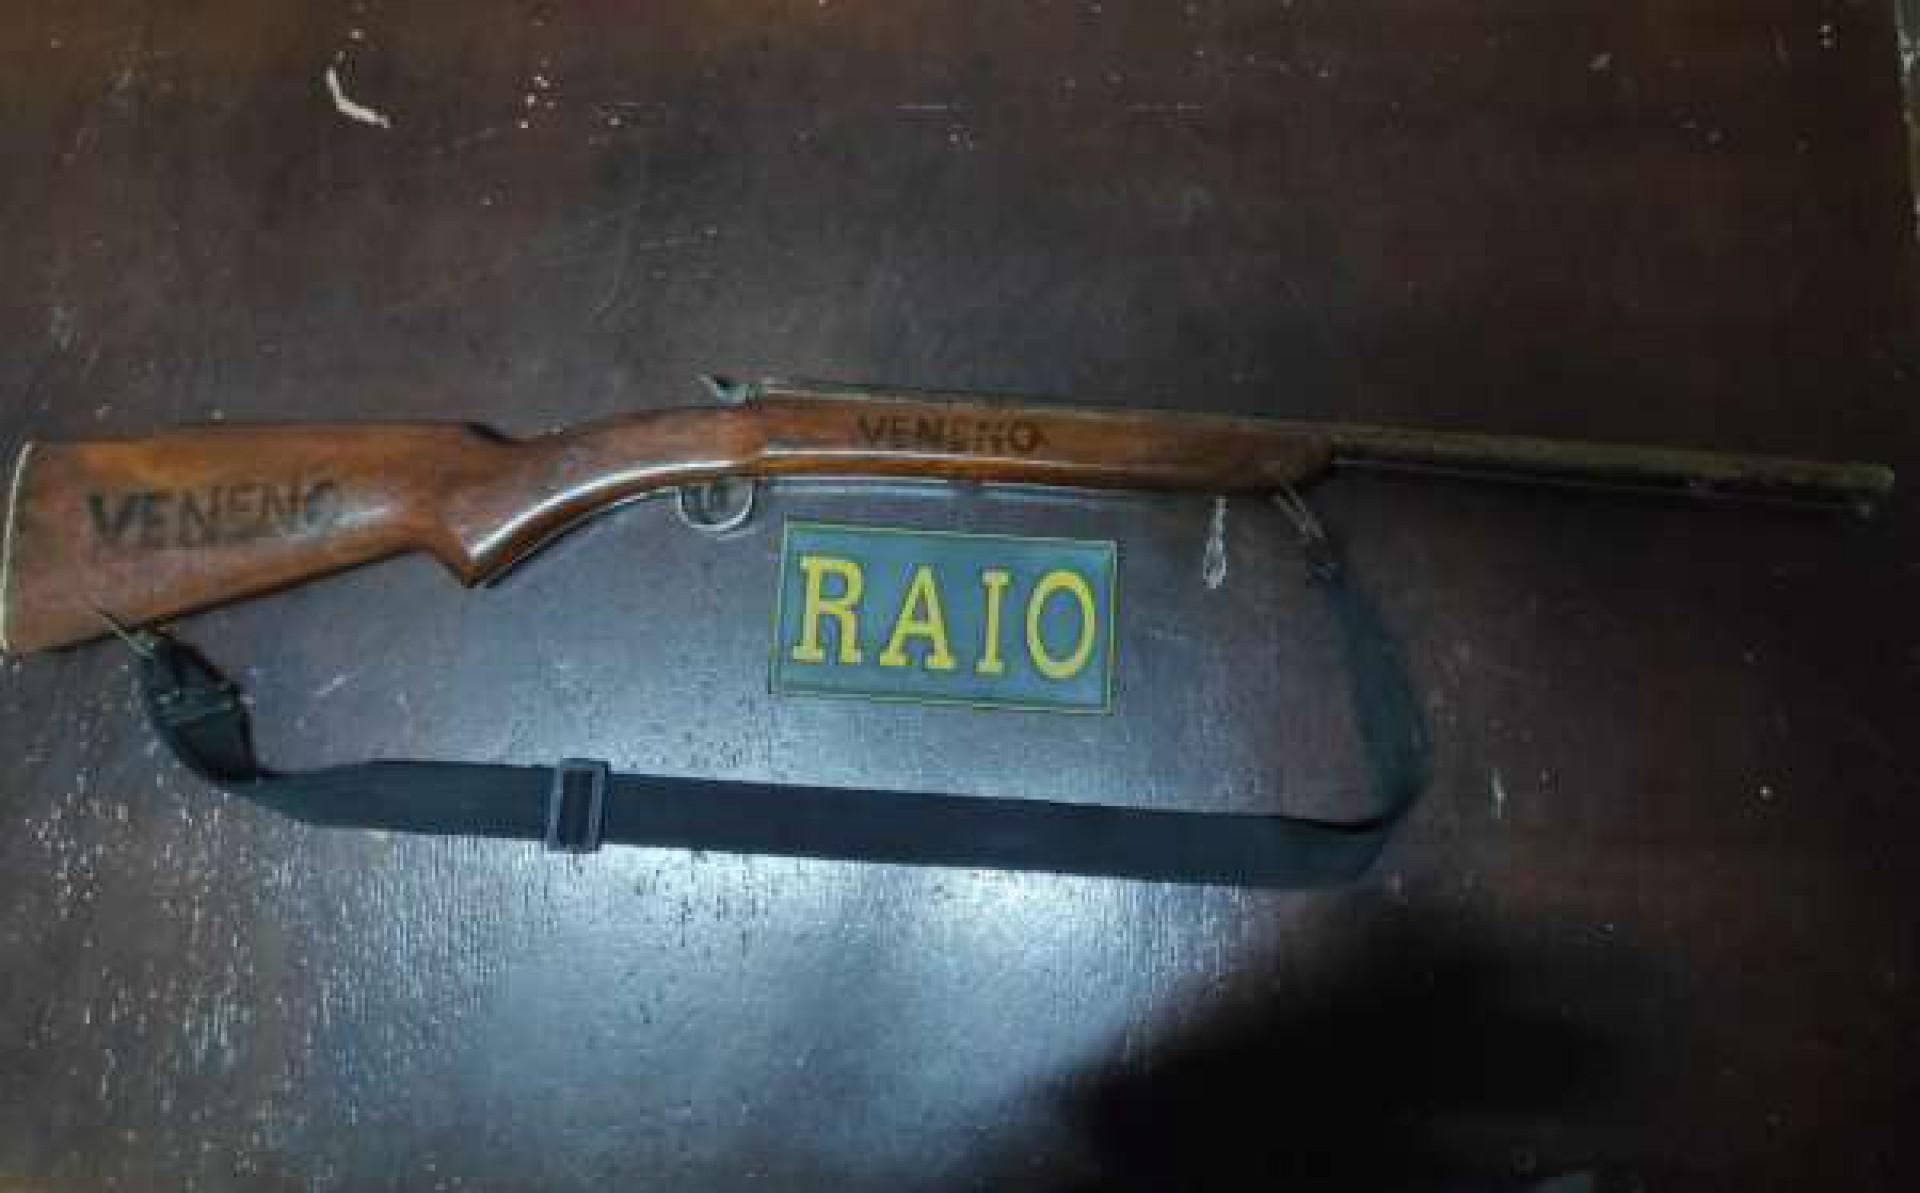 Arma artesanal contém a palavra